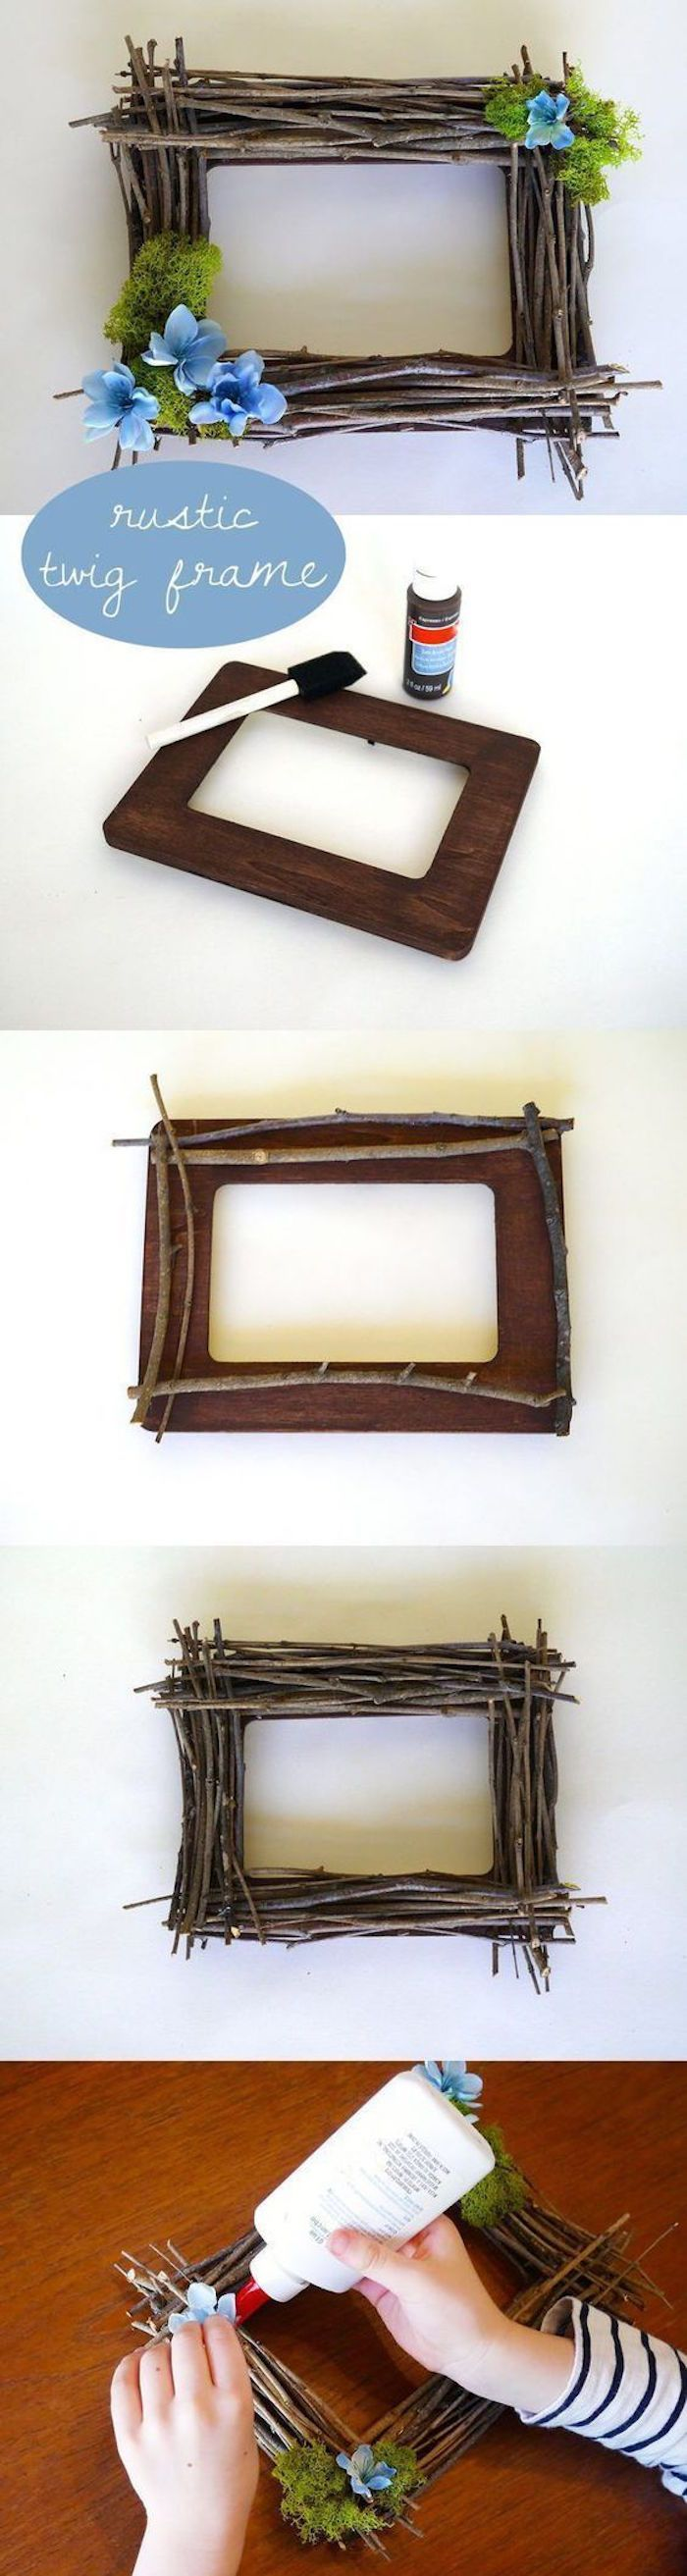 Wohnaccessoires aus holz selber machen  DIY Deko Idee, Rahmen aus Holz basteln | Basteln | Pinterest ...